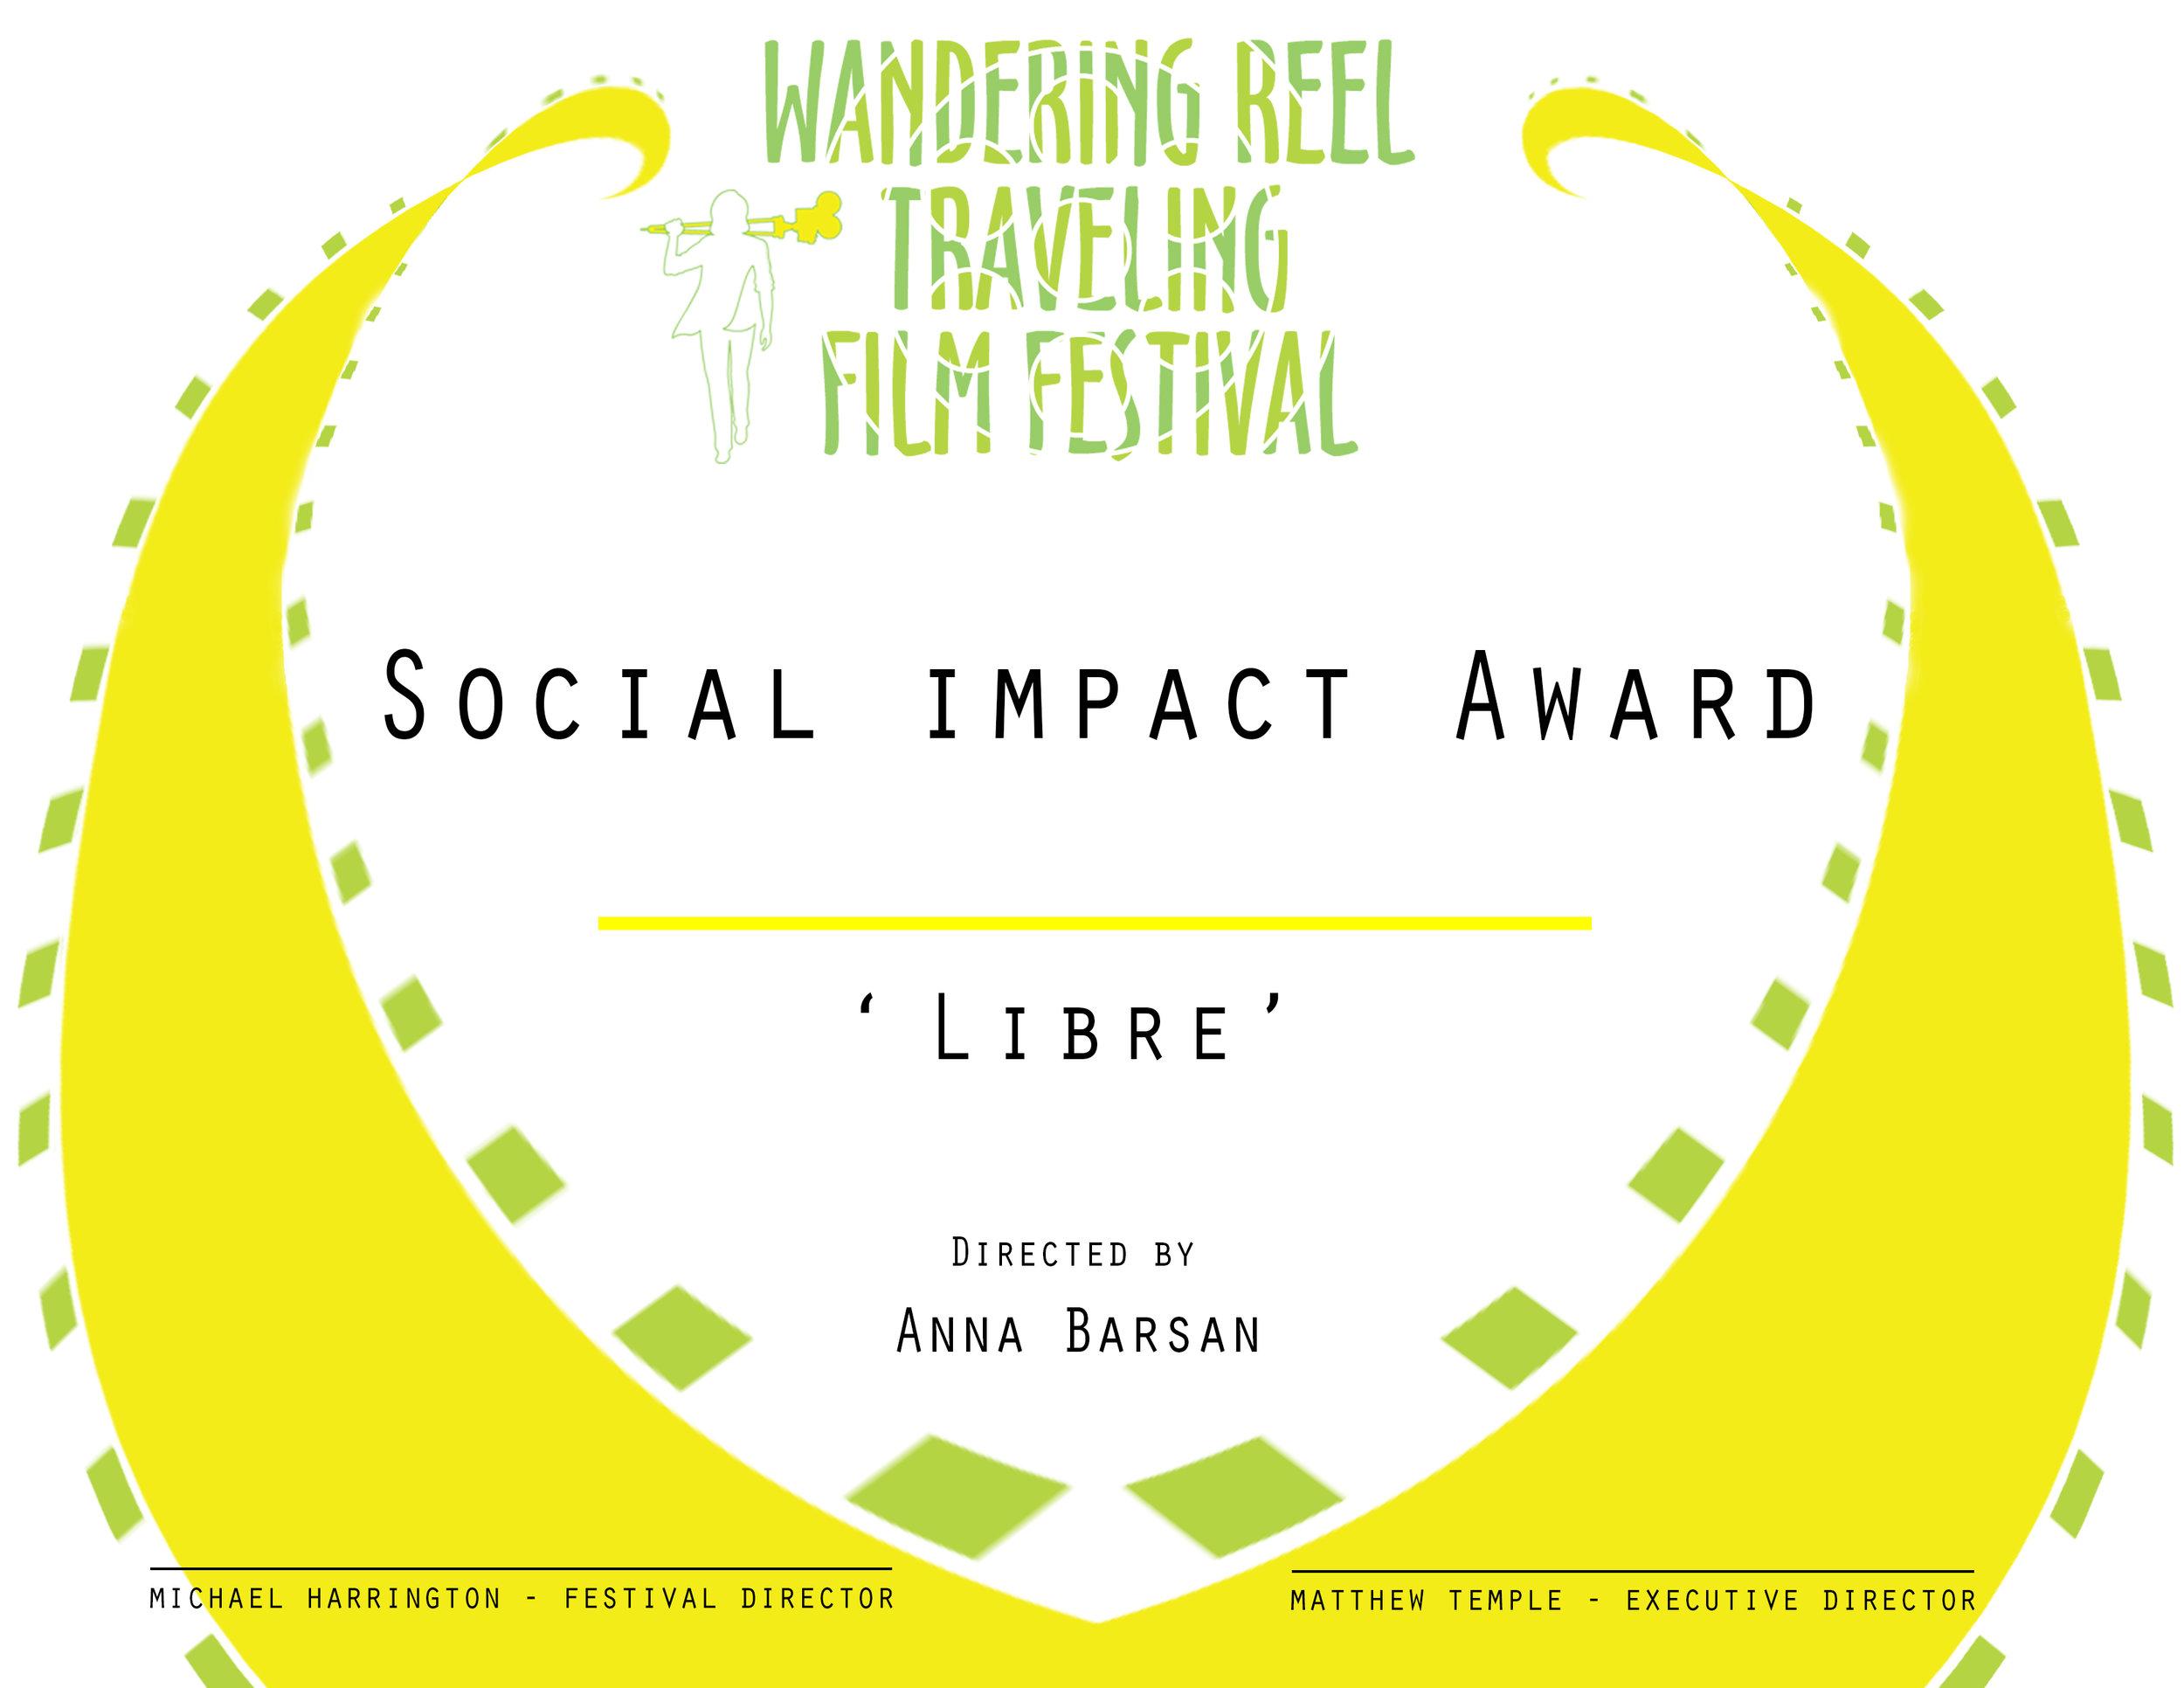 Social impact s4 barsan.jpg